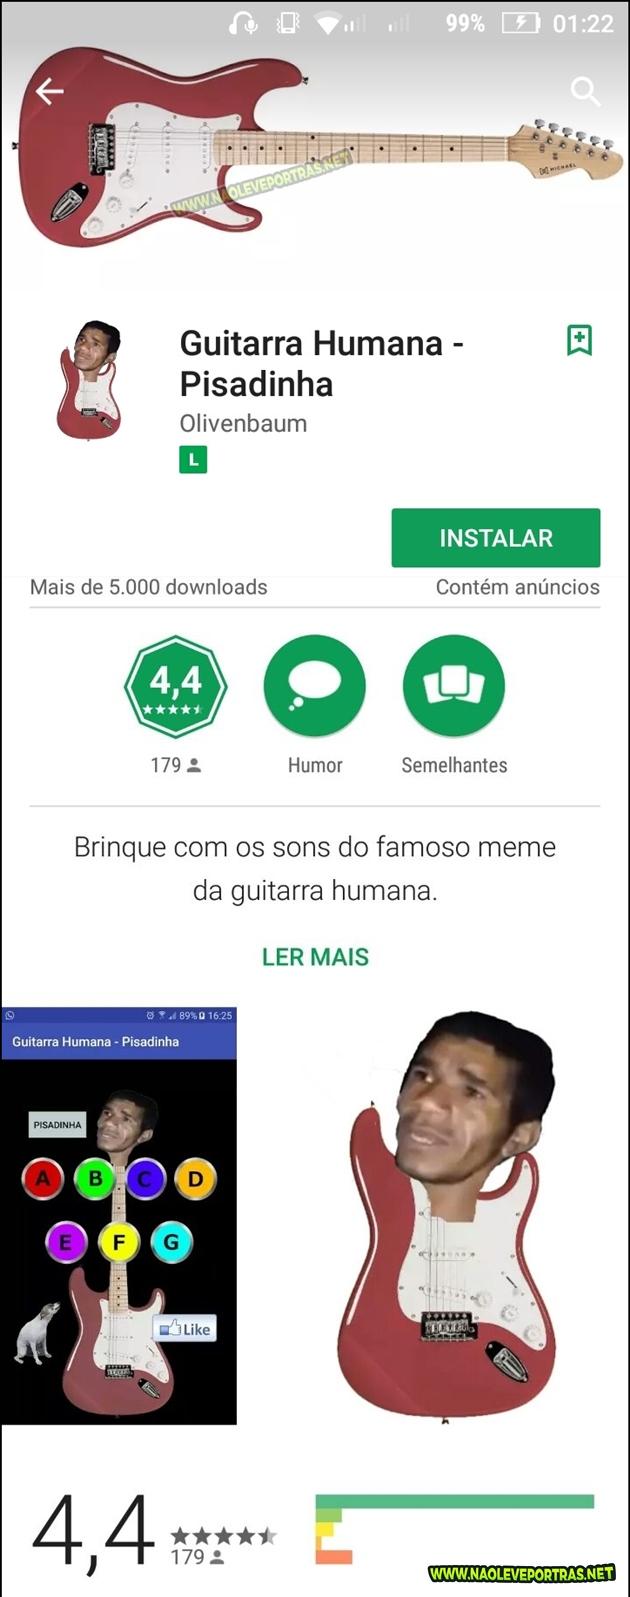 aplicativo guitarra humana